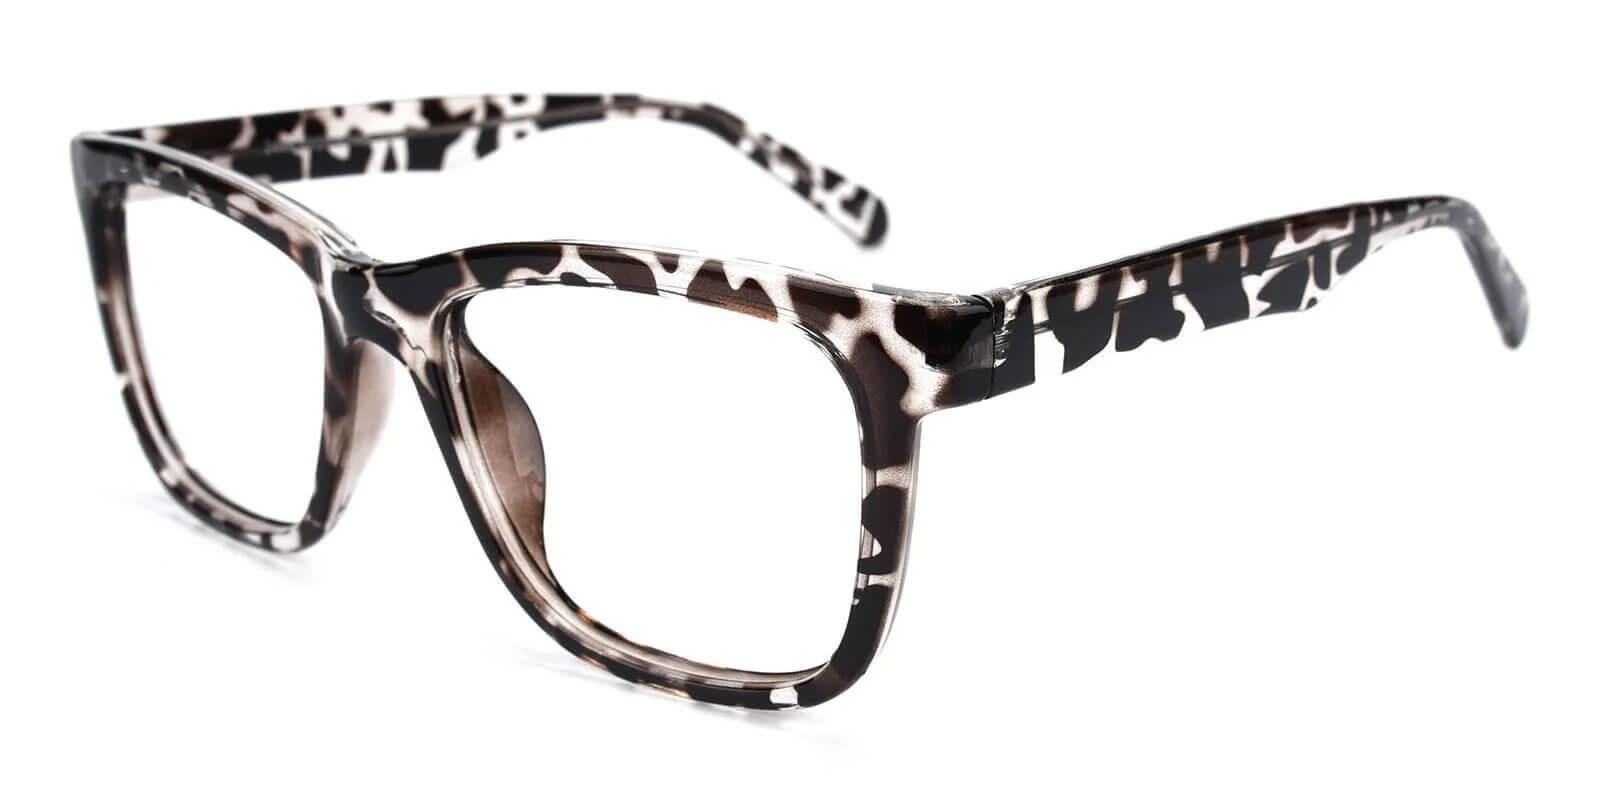 Laya Leopard Plastic Eyeglasses , UniversalBridgeFit Frames from ABBE Glasses